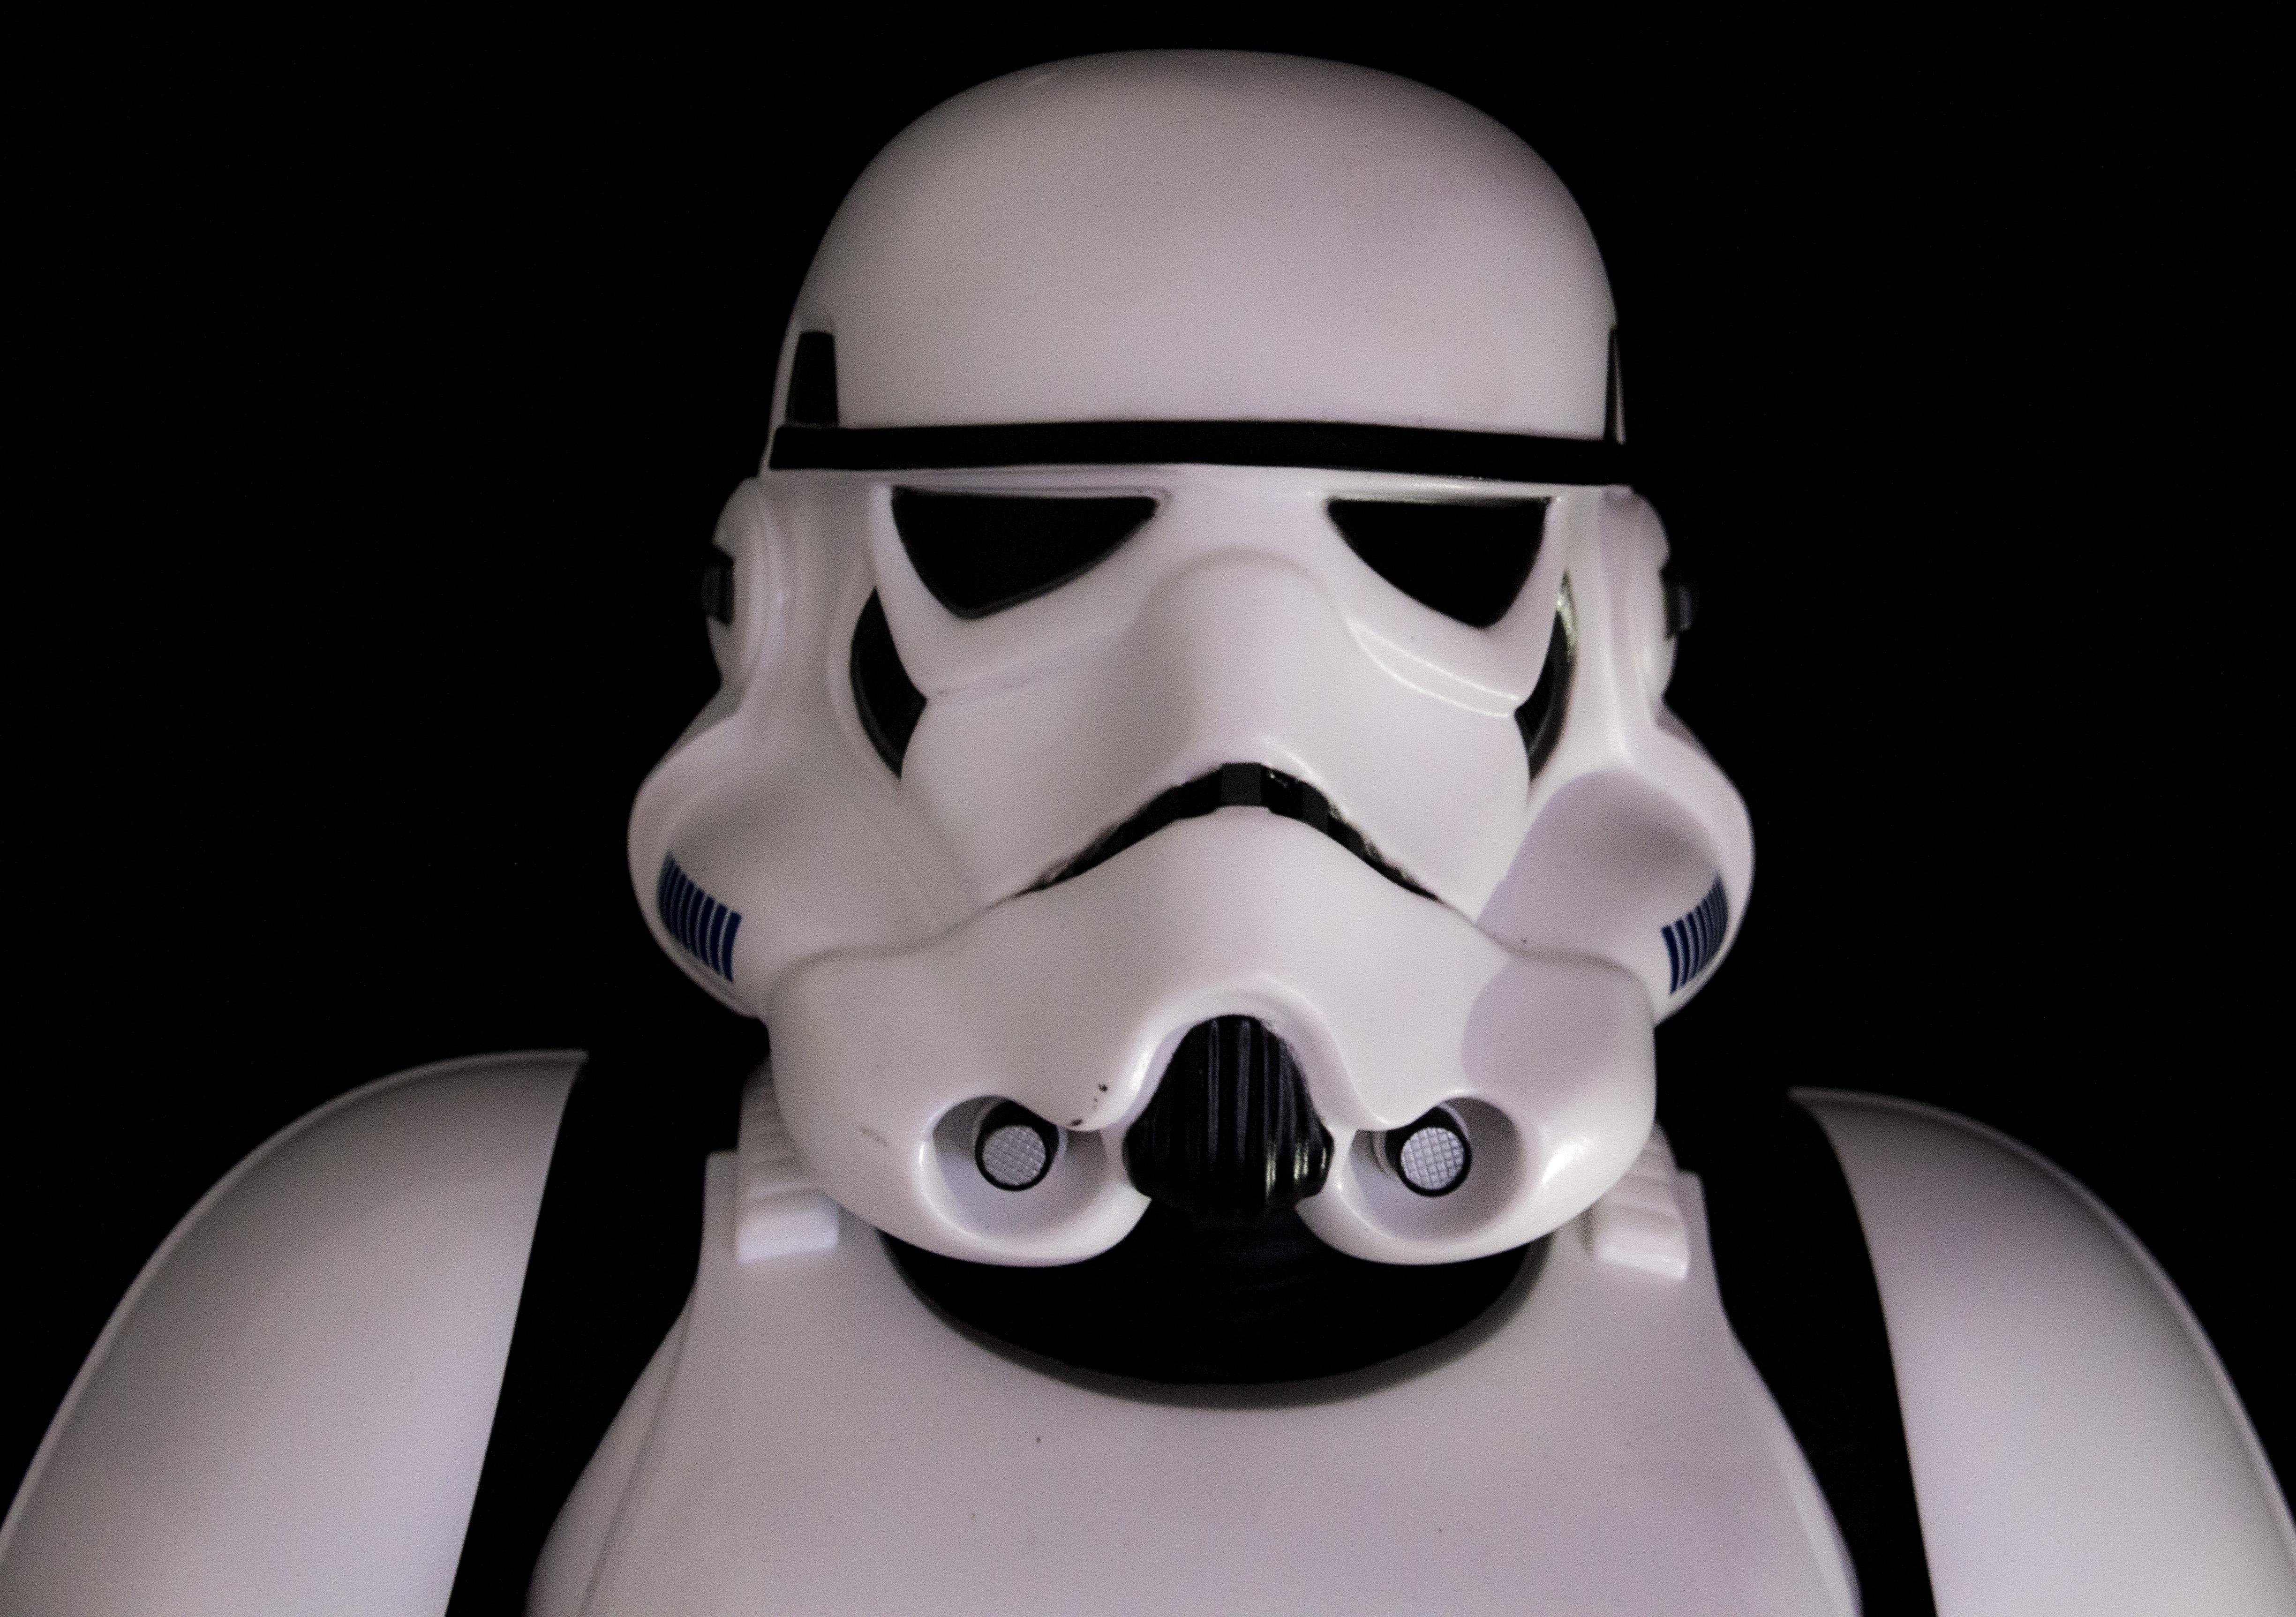 Gambar Manusia Putih Tentara Kegelapan Pakaian Hitam Satu